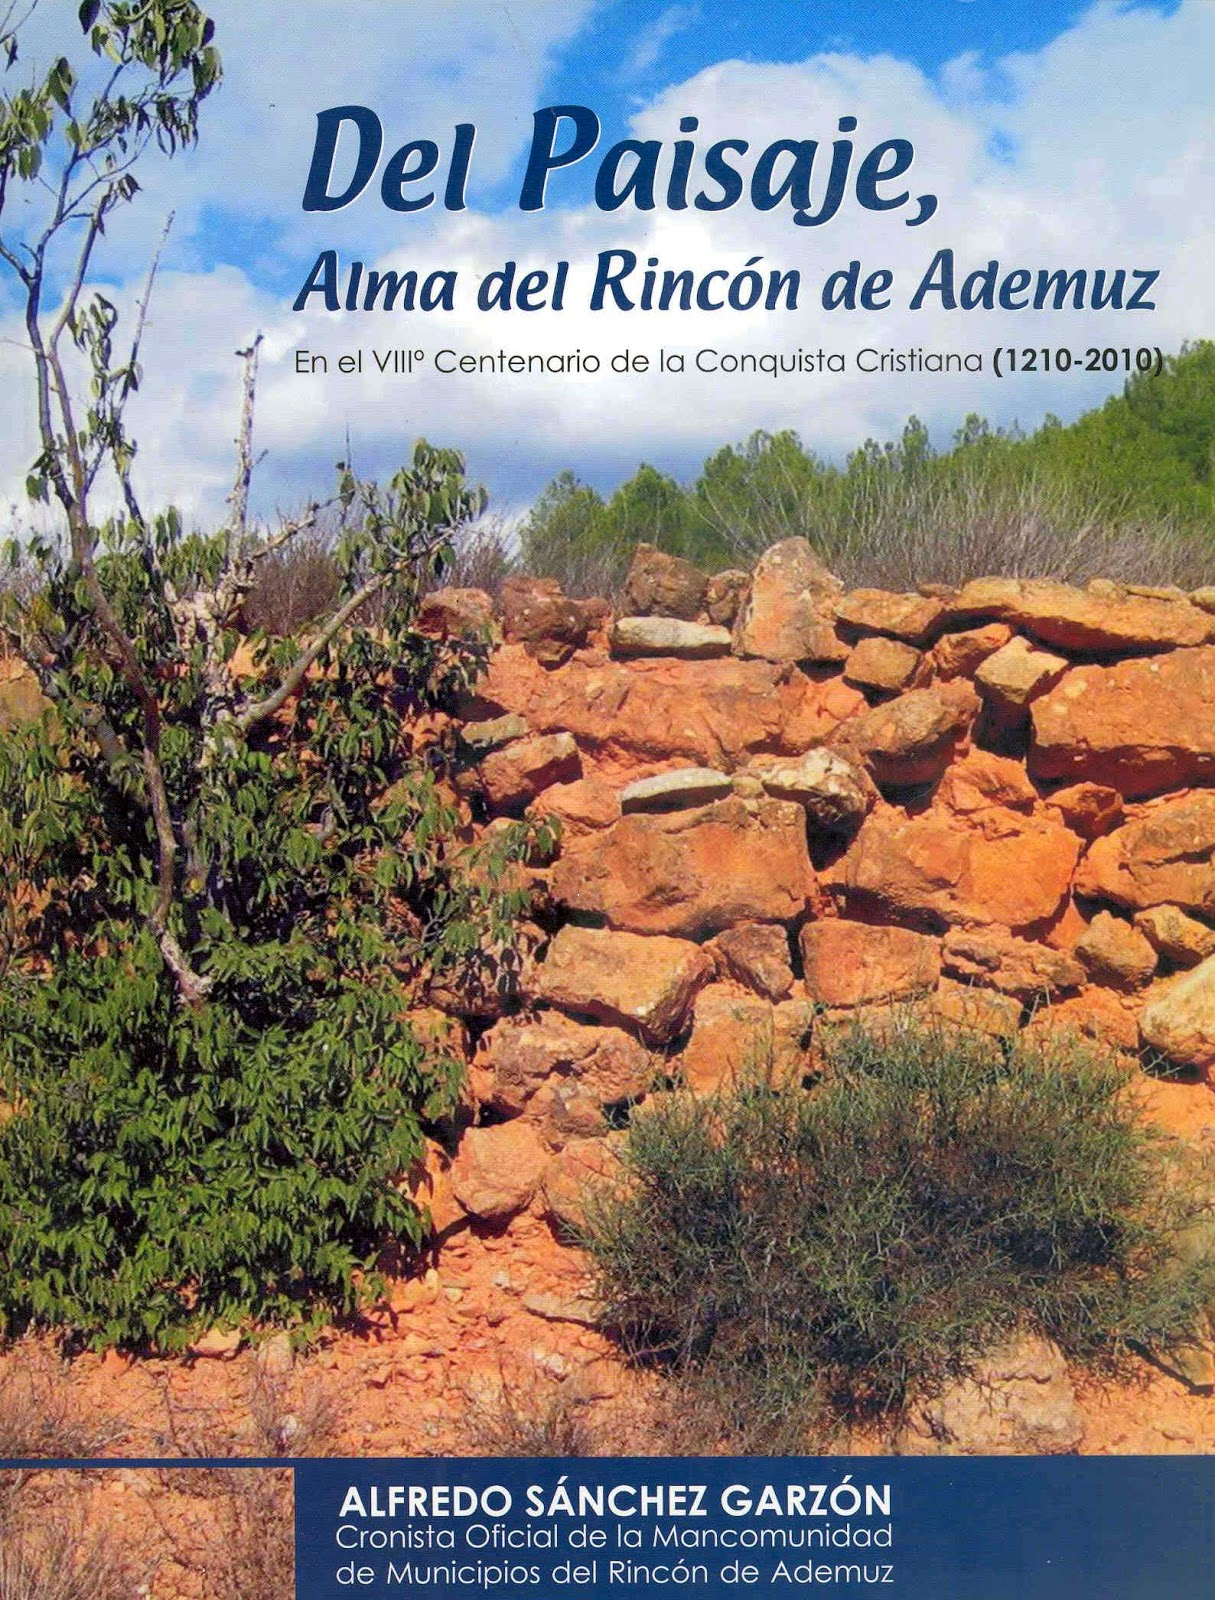 paisaje-alama-rincon-alfredo-sanchez-garzon-2007